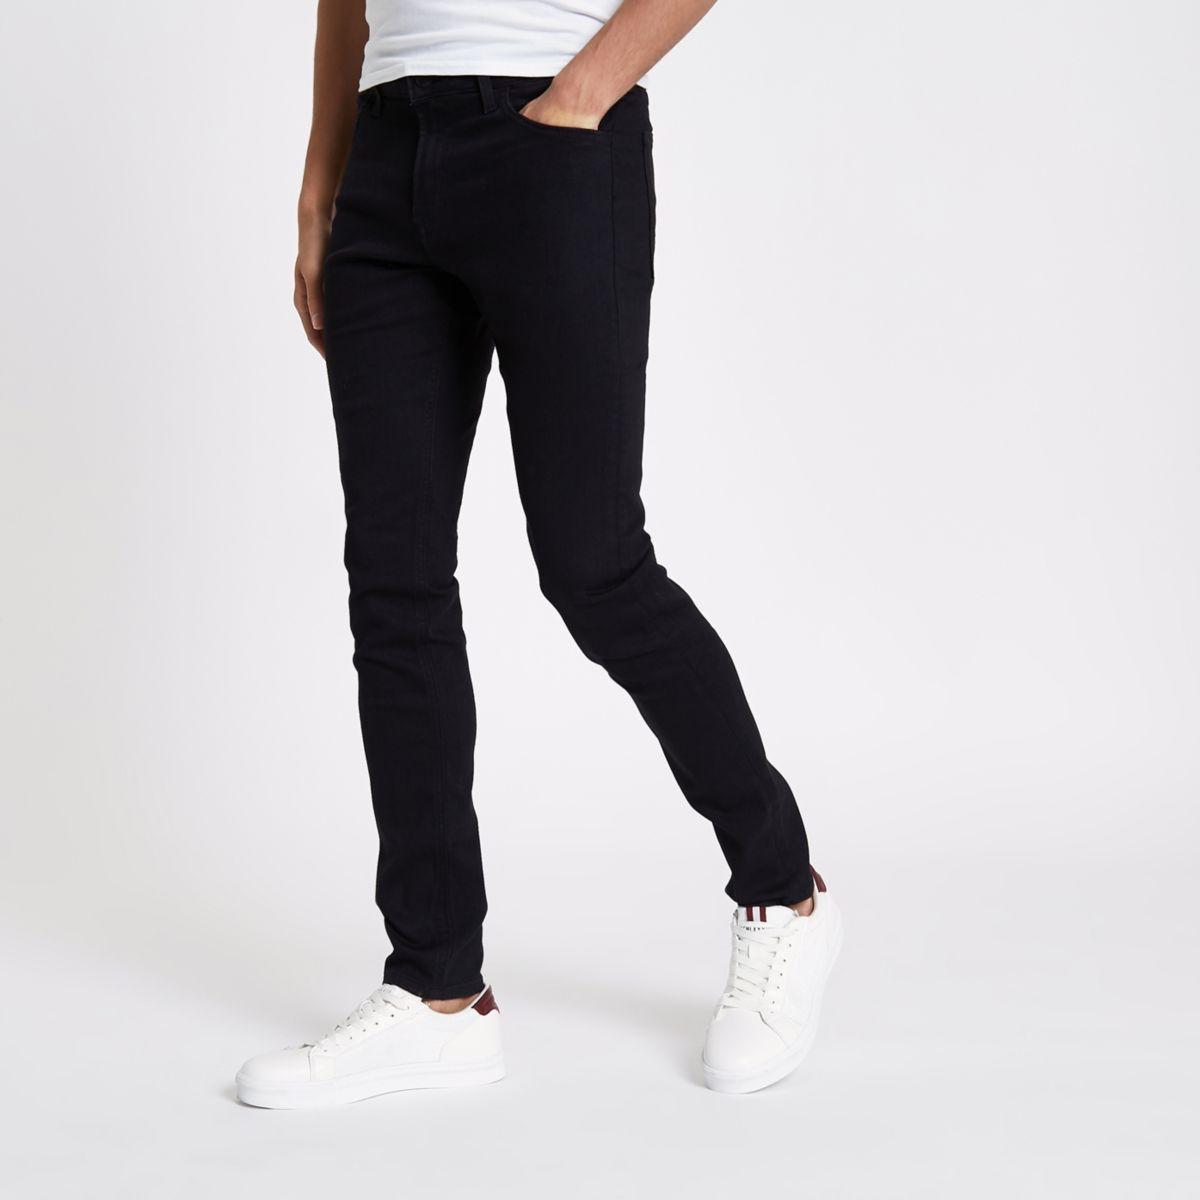 Lee black skinny fit Malone jeans